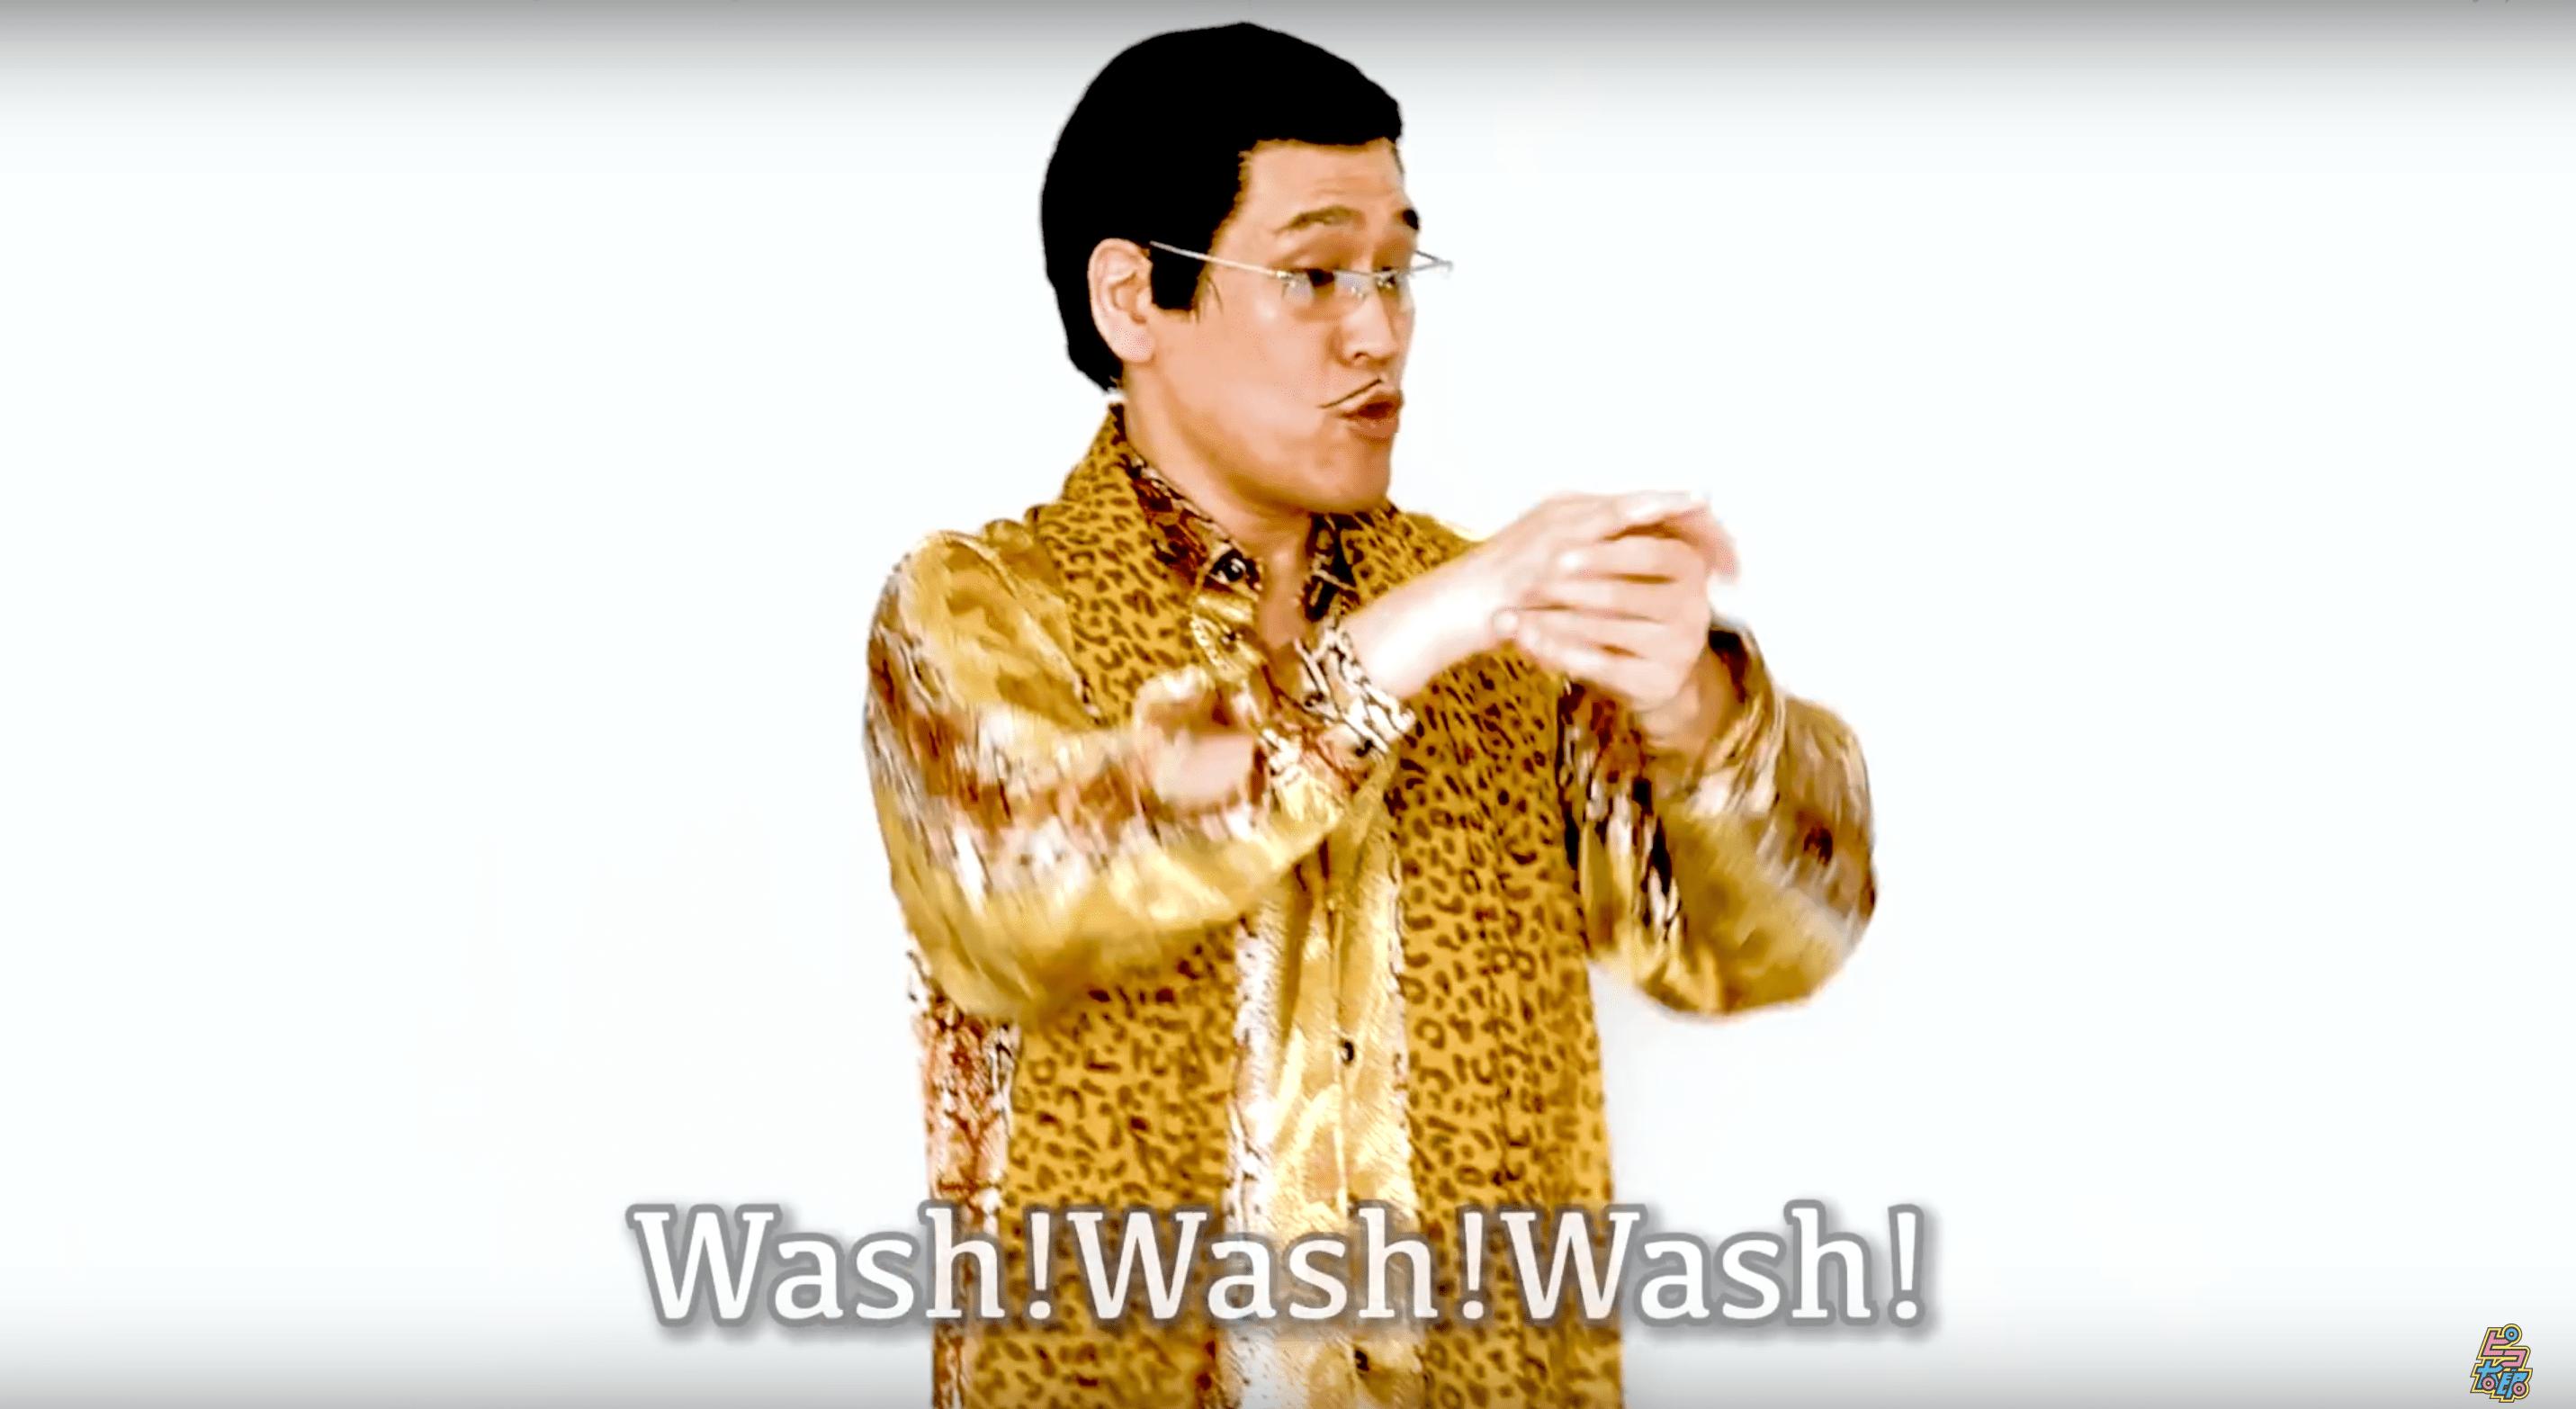 PIKO太郎推防疫版《PPAP》 洗腦歌詞教洗手